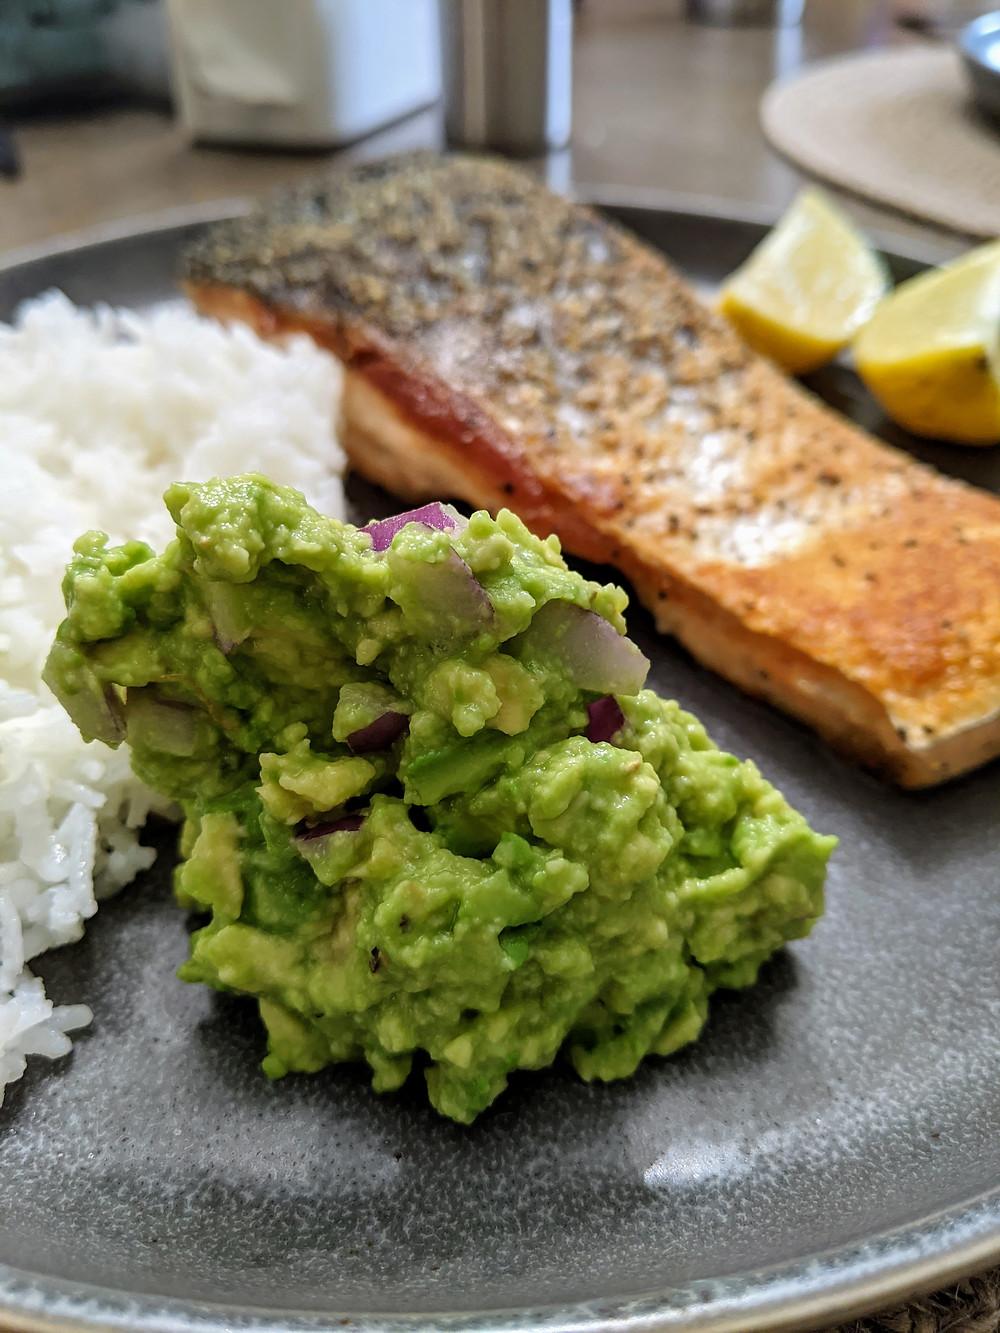 Garlic Salmon with an Avocado Salsa - The Sunday Cookbook - Food allergy recipes